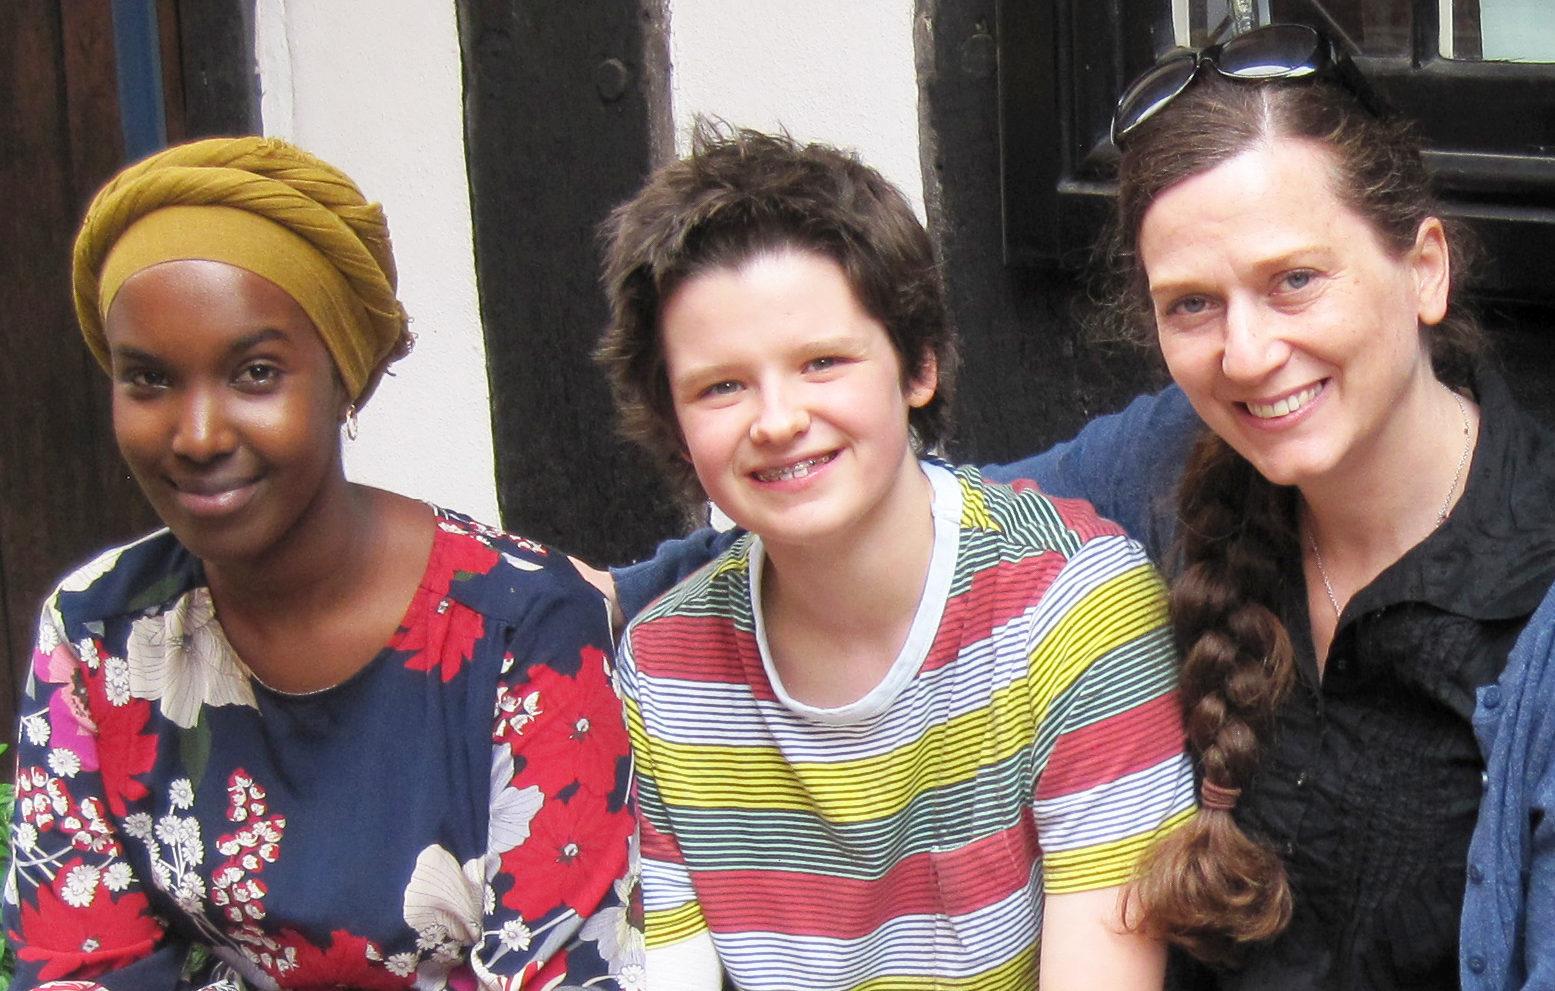 Photo of poet Warda Yassin, young writer Georgie Woodhead and Vicky Morris